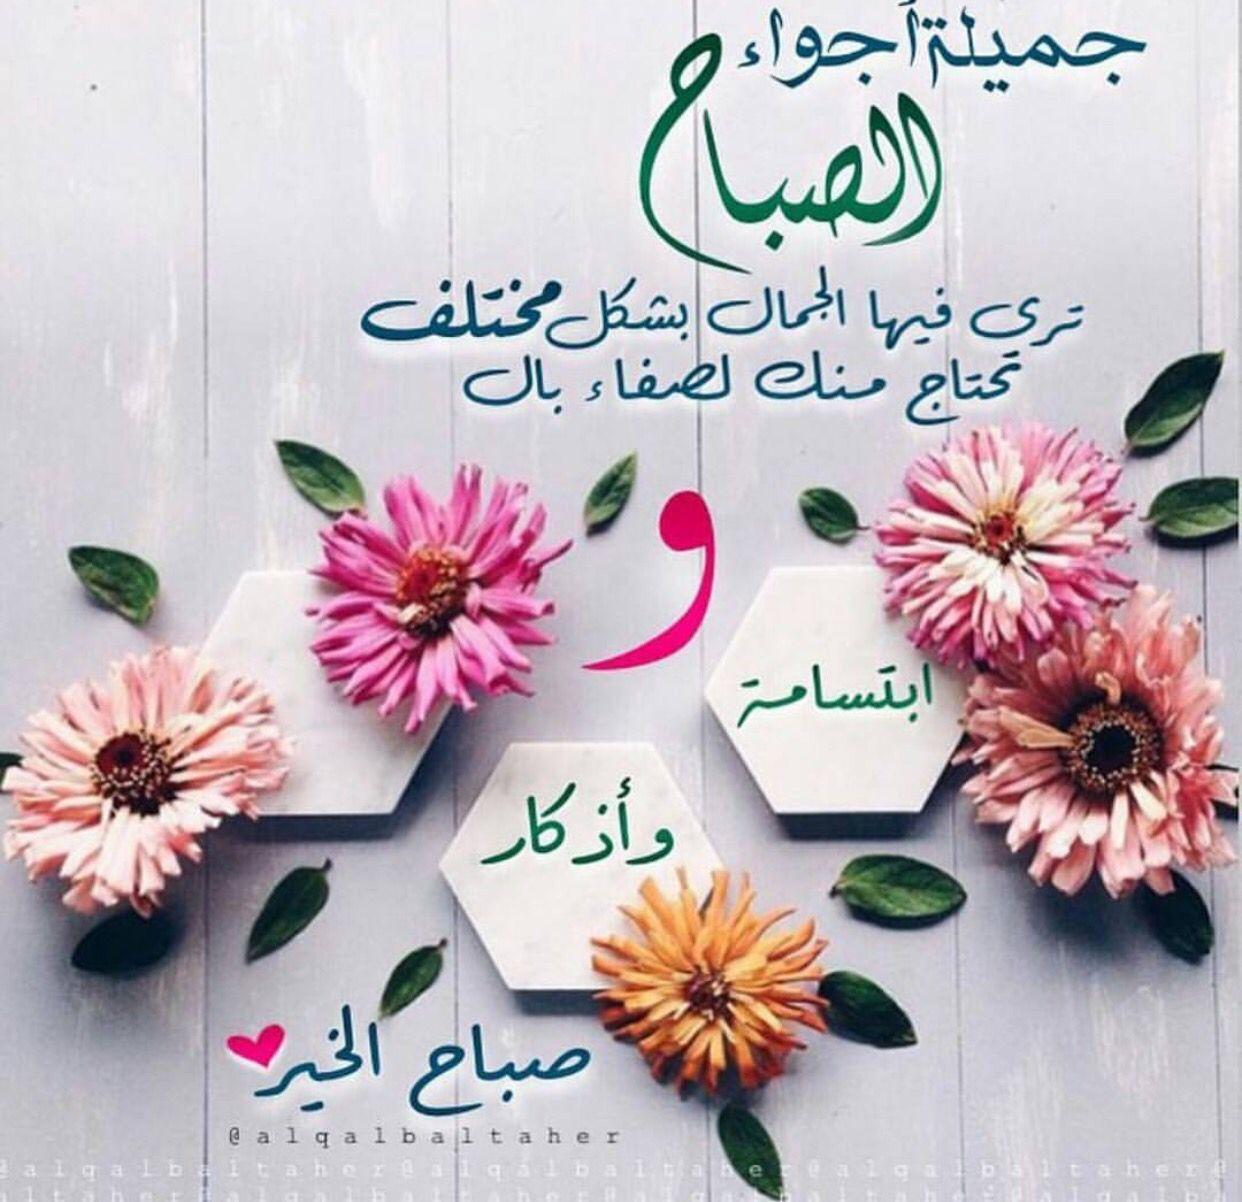 صباح جميل Morning Greeting Islamic Messages Islamic Art Calligraphy